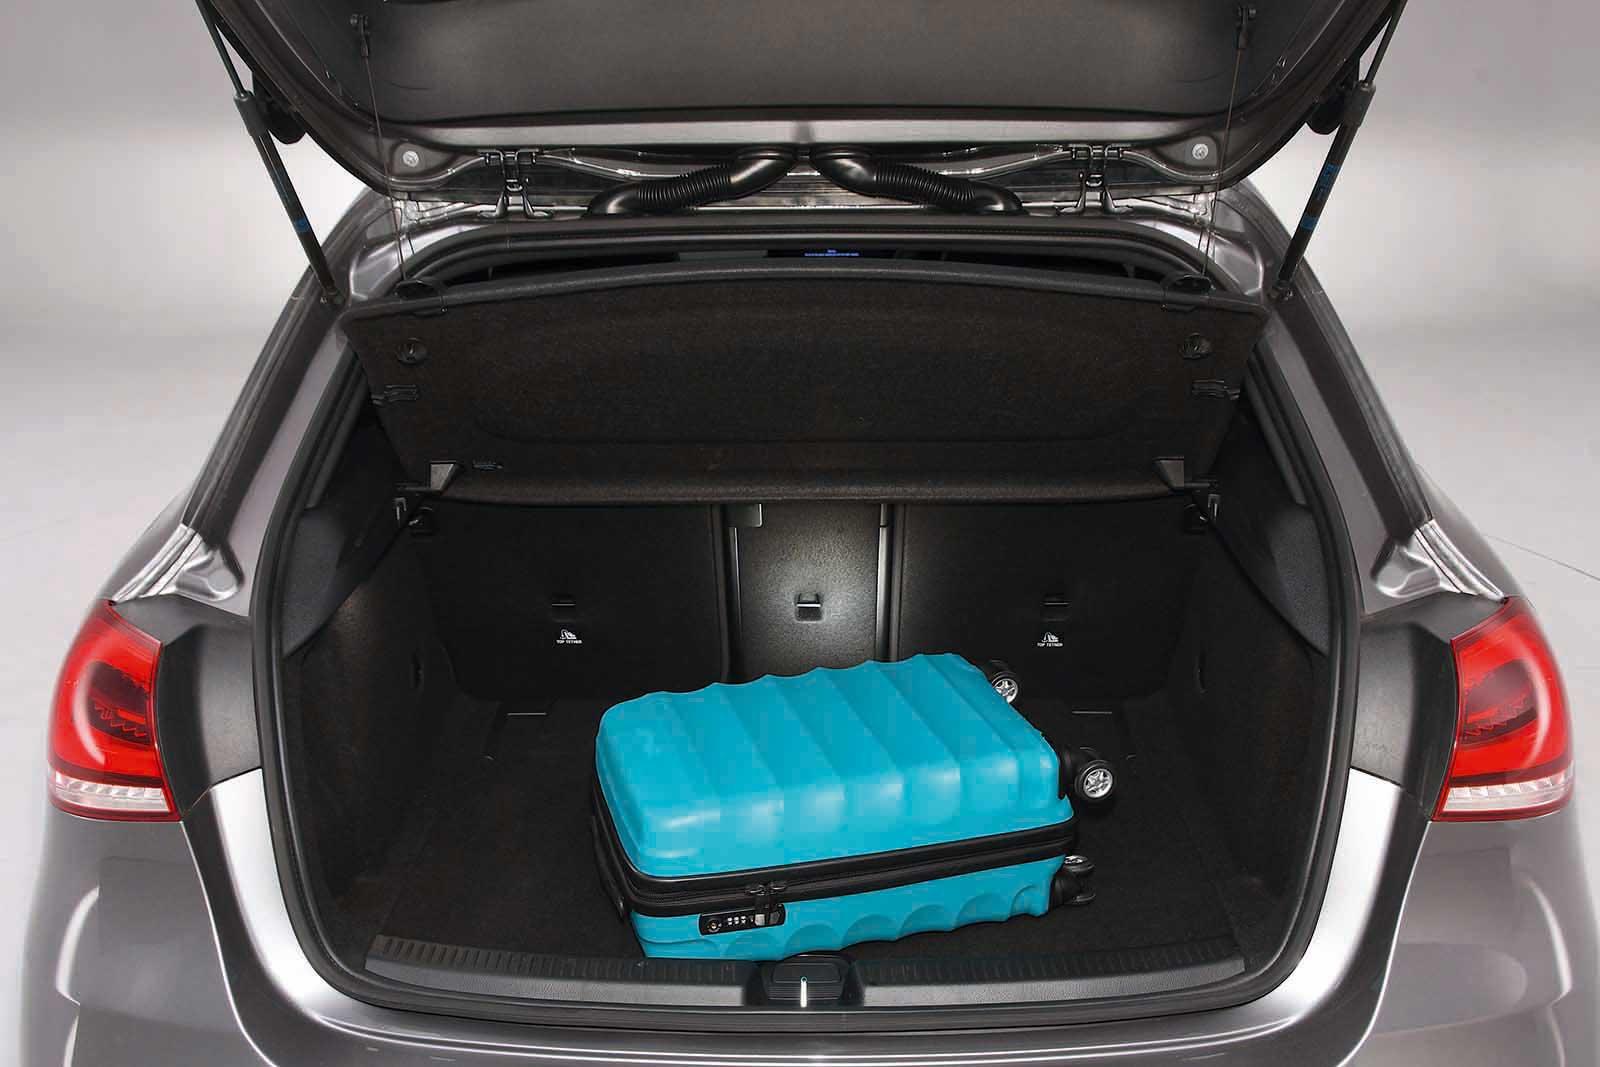 Mercedes-AMG A35 boot